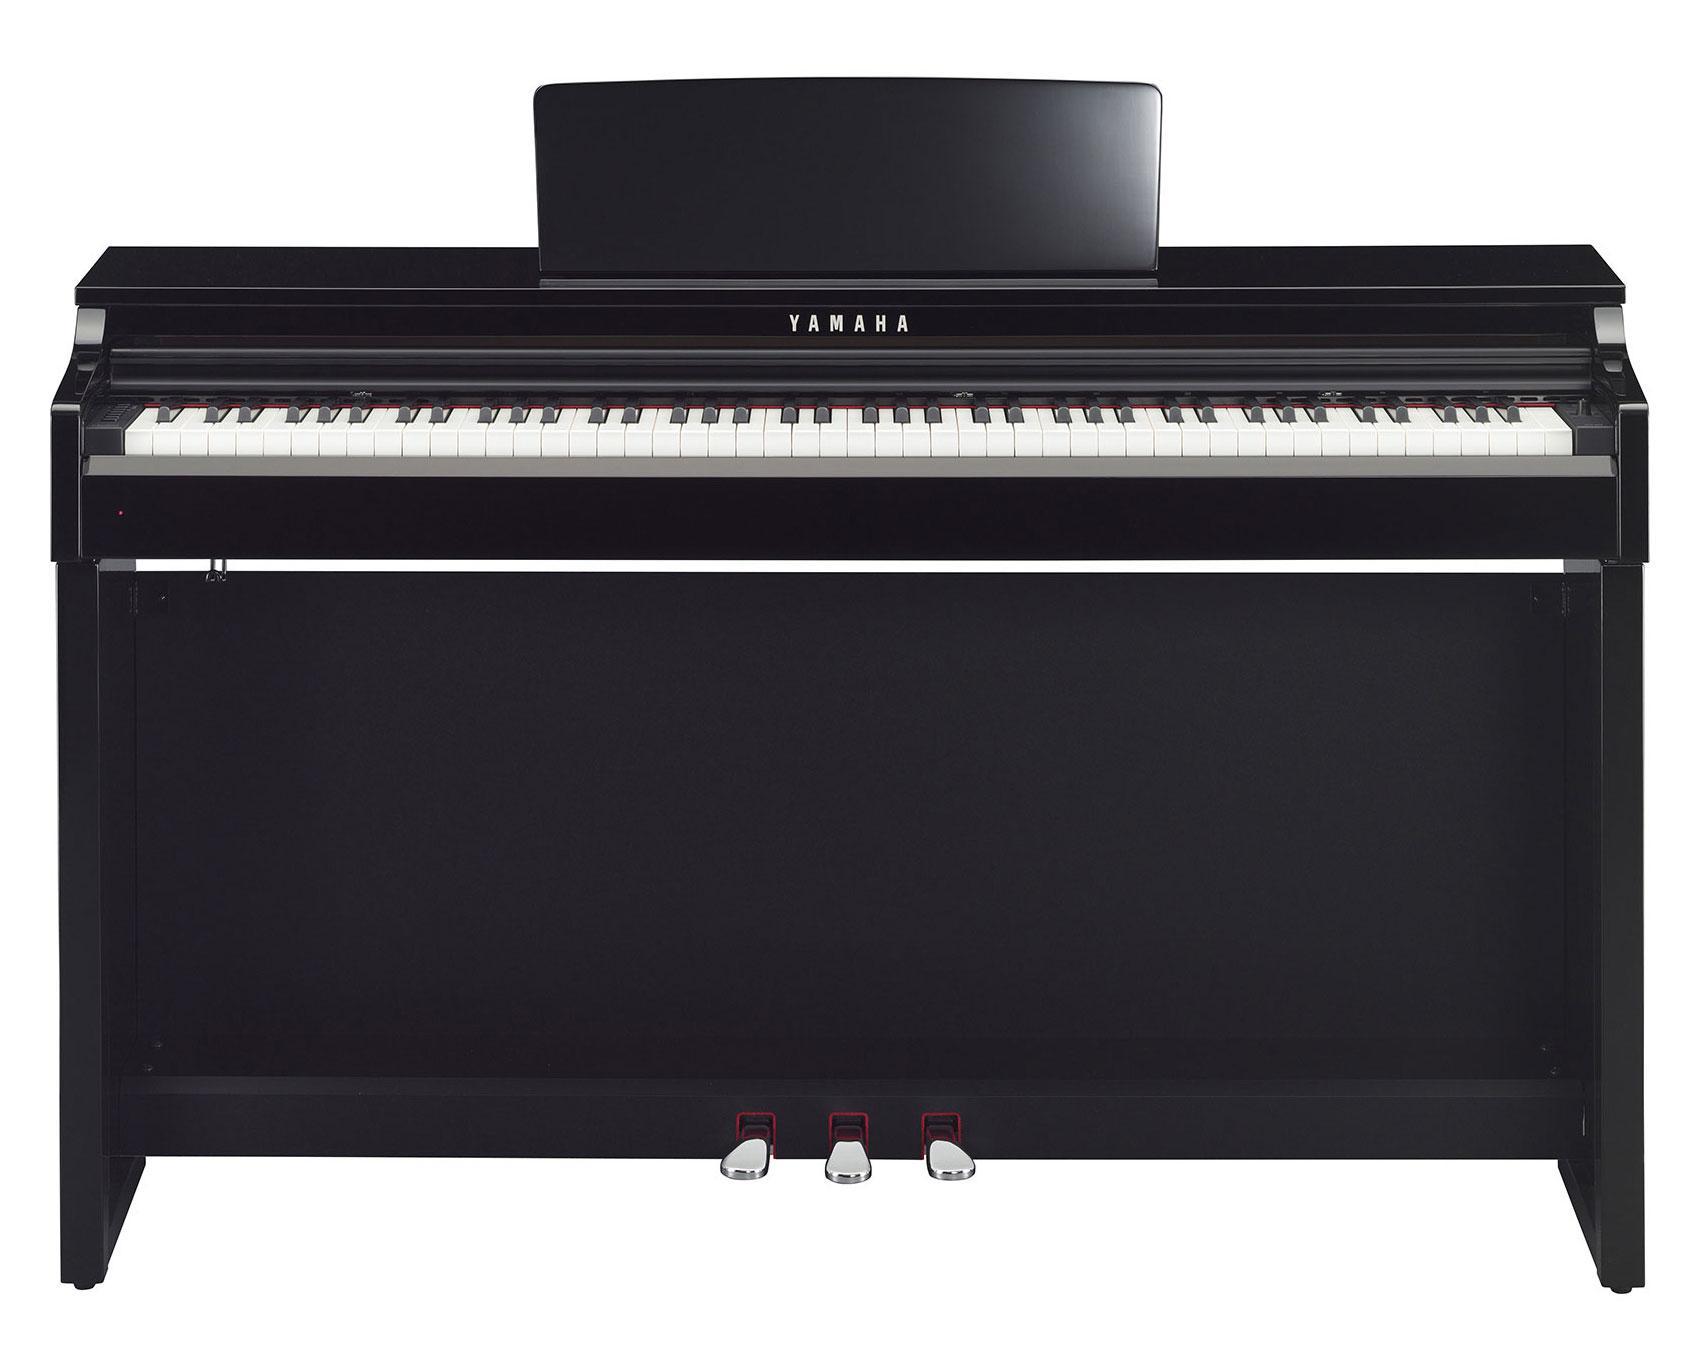 yamaha clp 525 pe digitalpiano schwarz hochglanz. Black Bedroom Furniture Sets. Home Design Ideas